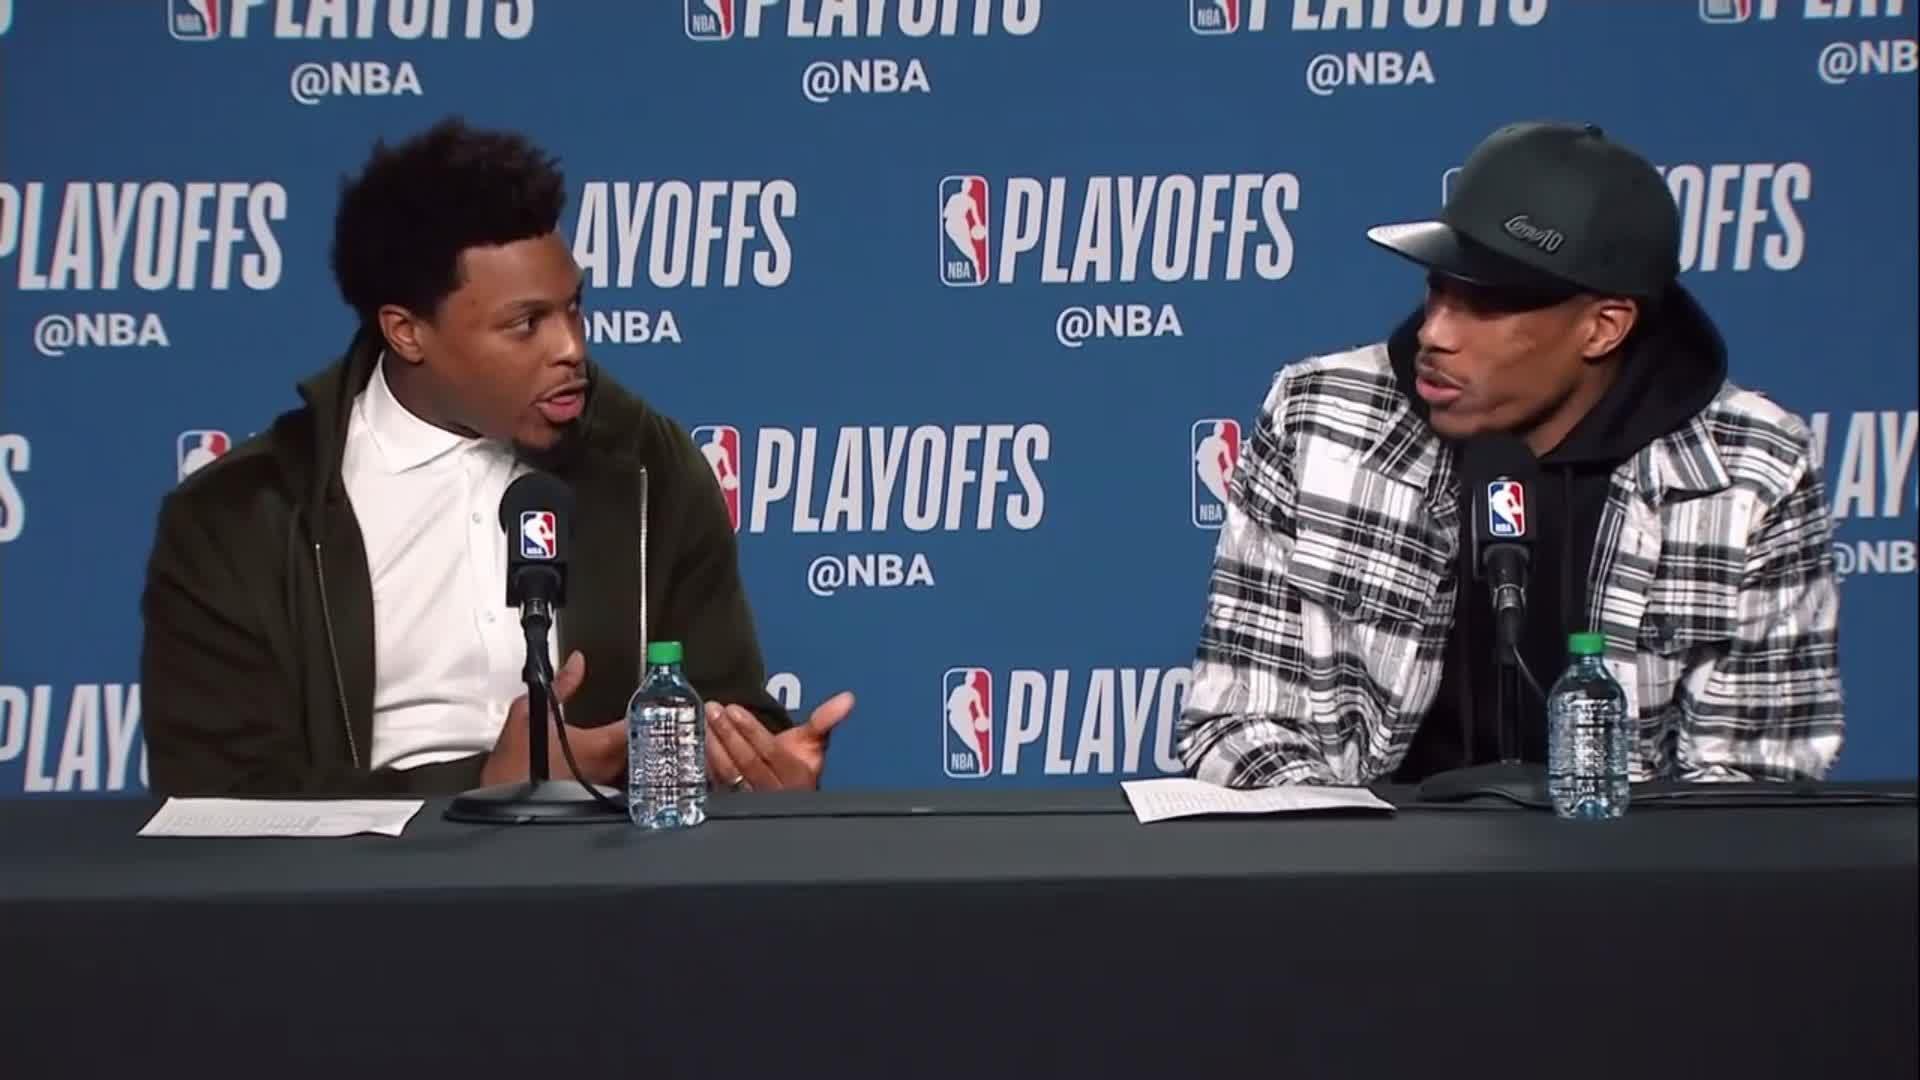 ��⬆️  The best soundbites from the #NBAPlayoffs! https://t.co/BgkInNfYQS